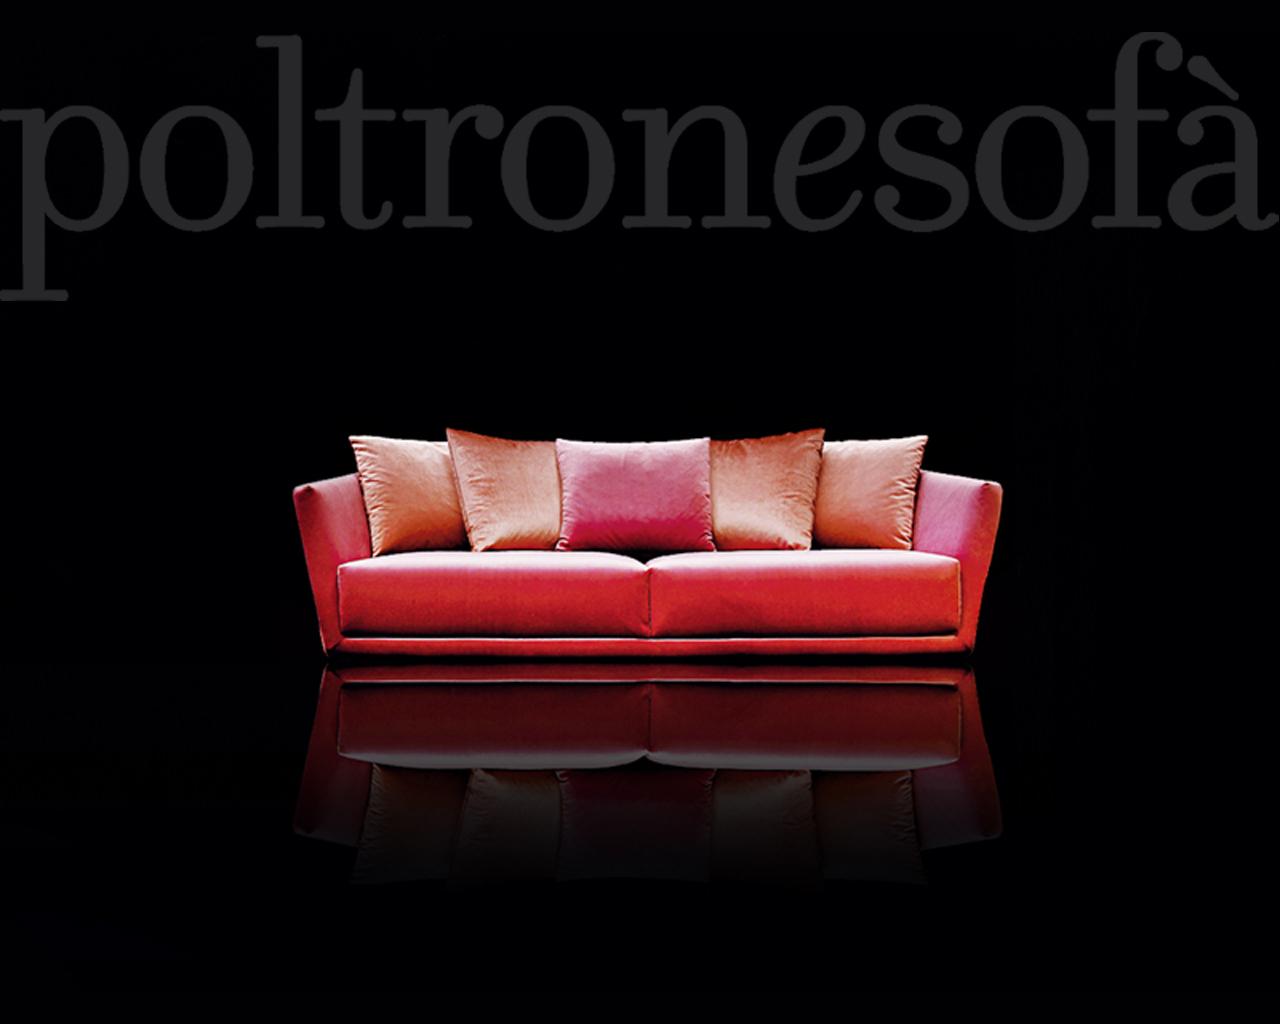 poltronesofa fip 3 related keywords poltronesofa fip 3 long tail keywords keywordsking. Black Bedroom Furniture Sets. Home Design Ideas